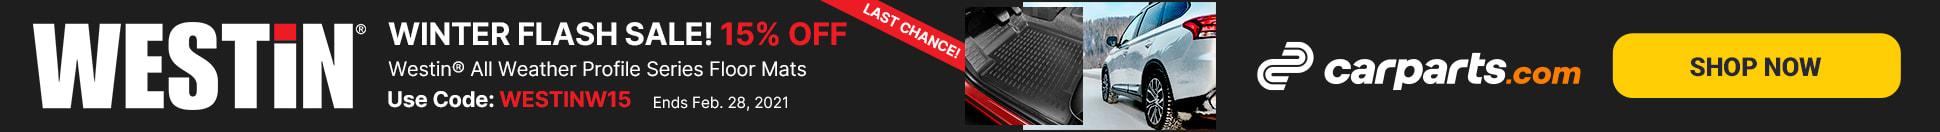 westin profile series flash sale last chance